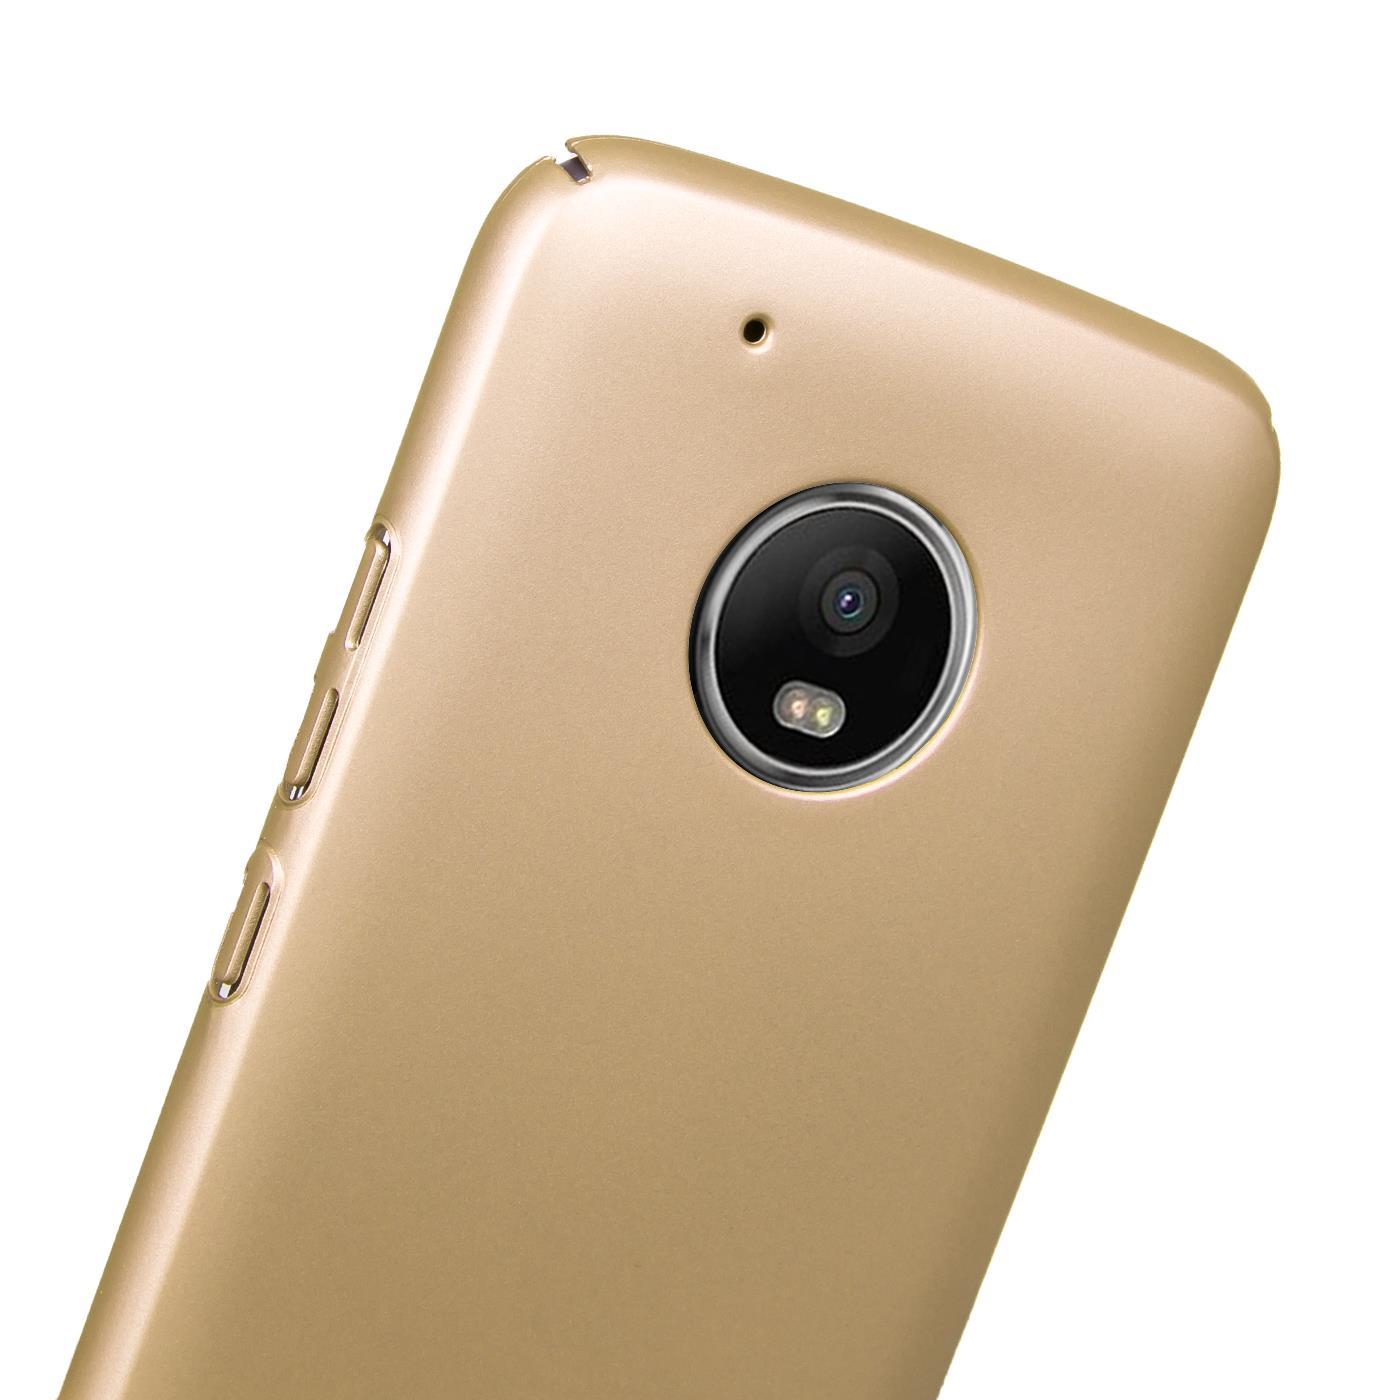 Motorola-Lenovo-Moto-G5-Huelle-Hardcase-Case-Schutz-Cover-Slim-Tasche-Handyhuelle Indexbild 5